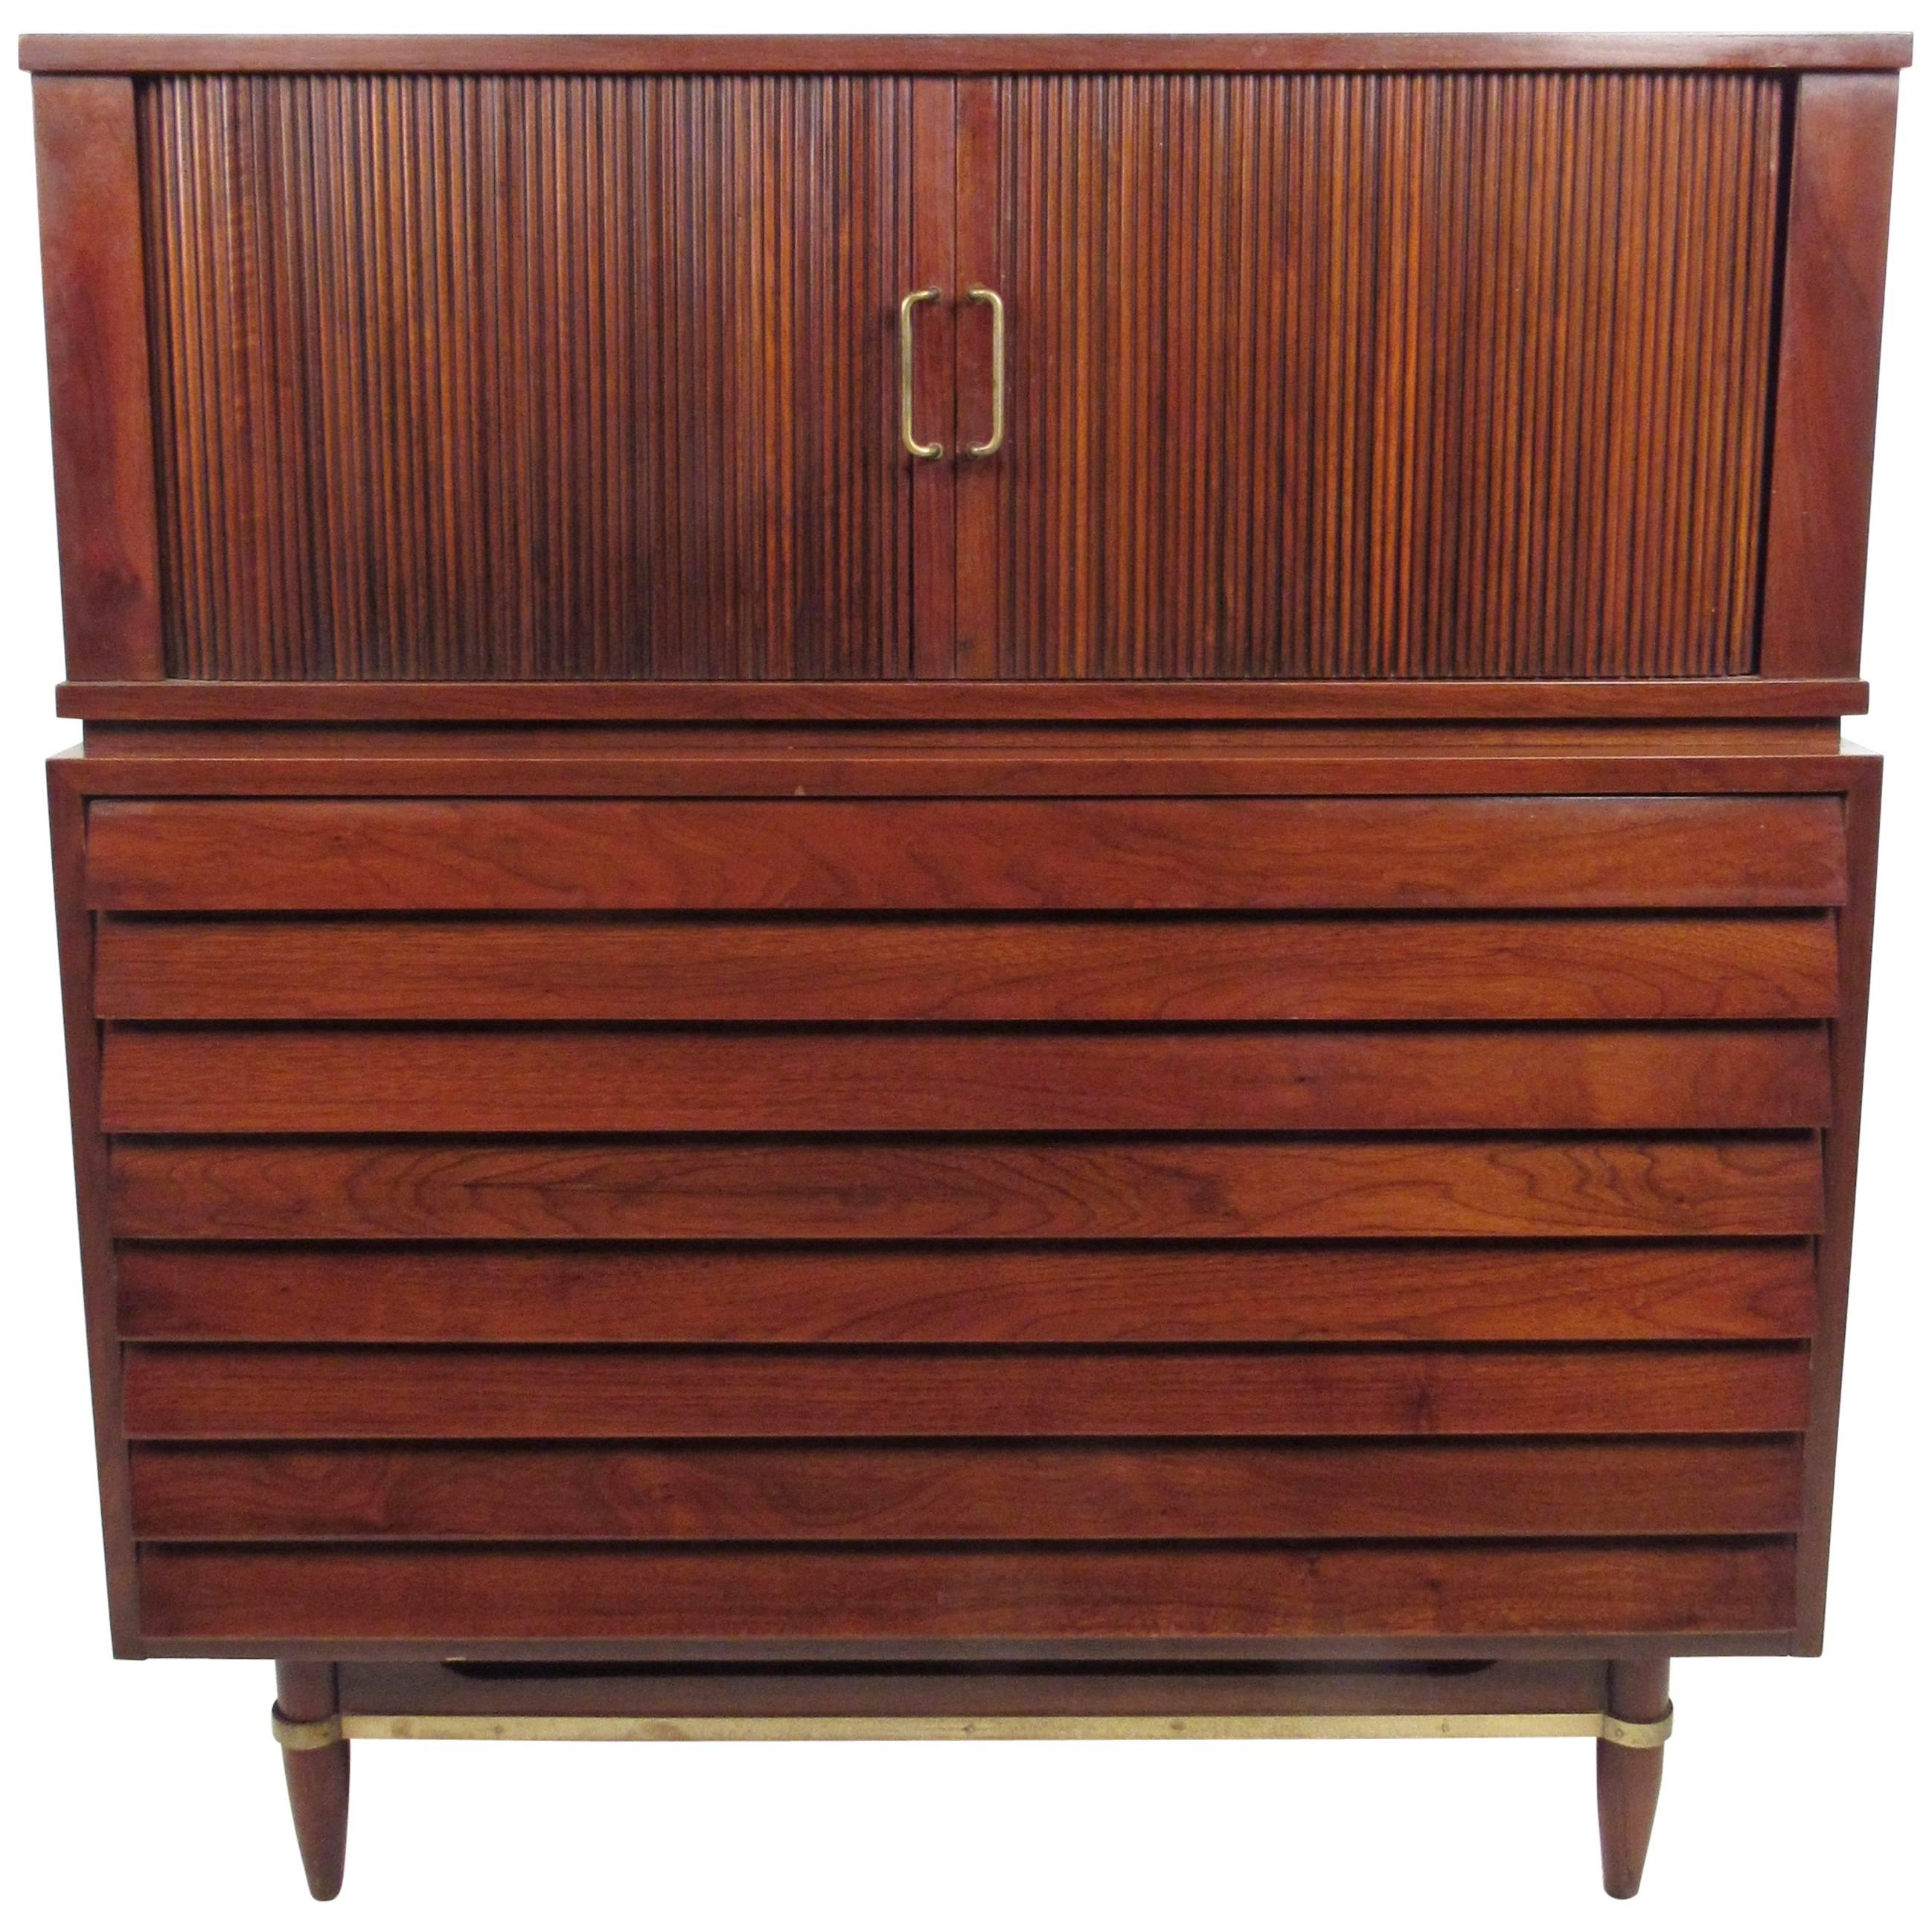 Vintage Highboy Dresser by American of Martinsville